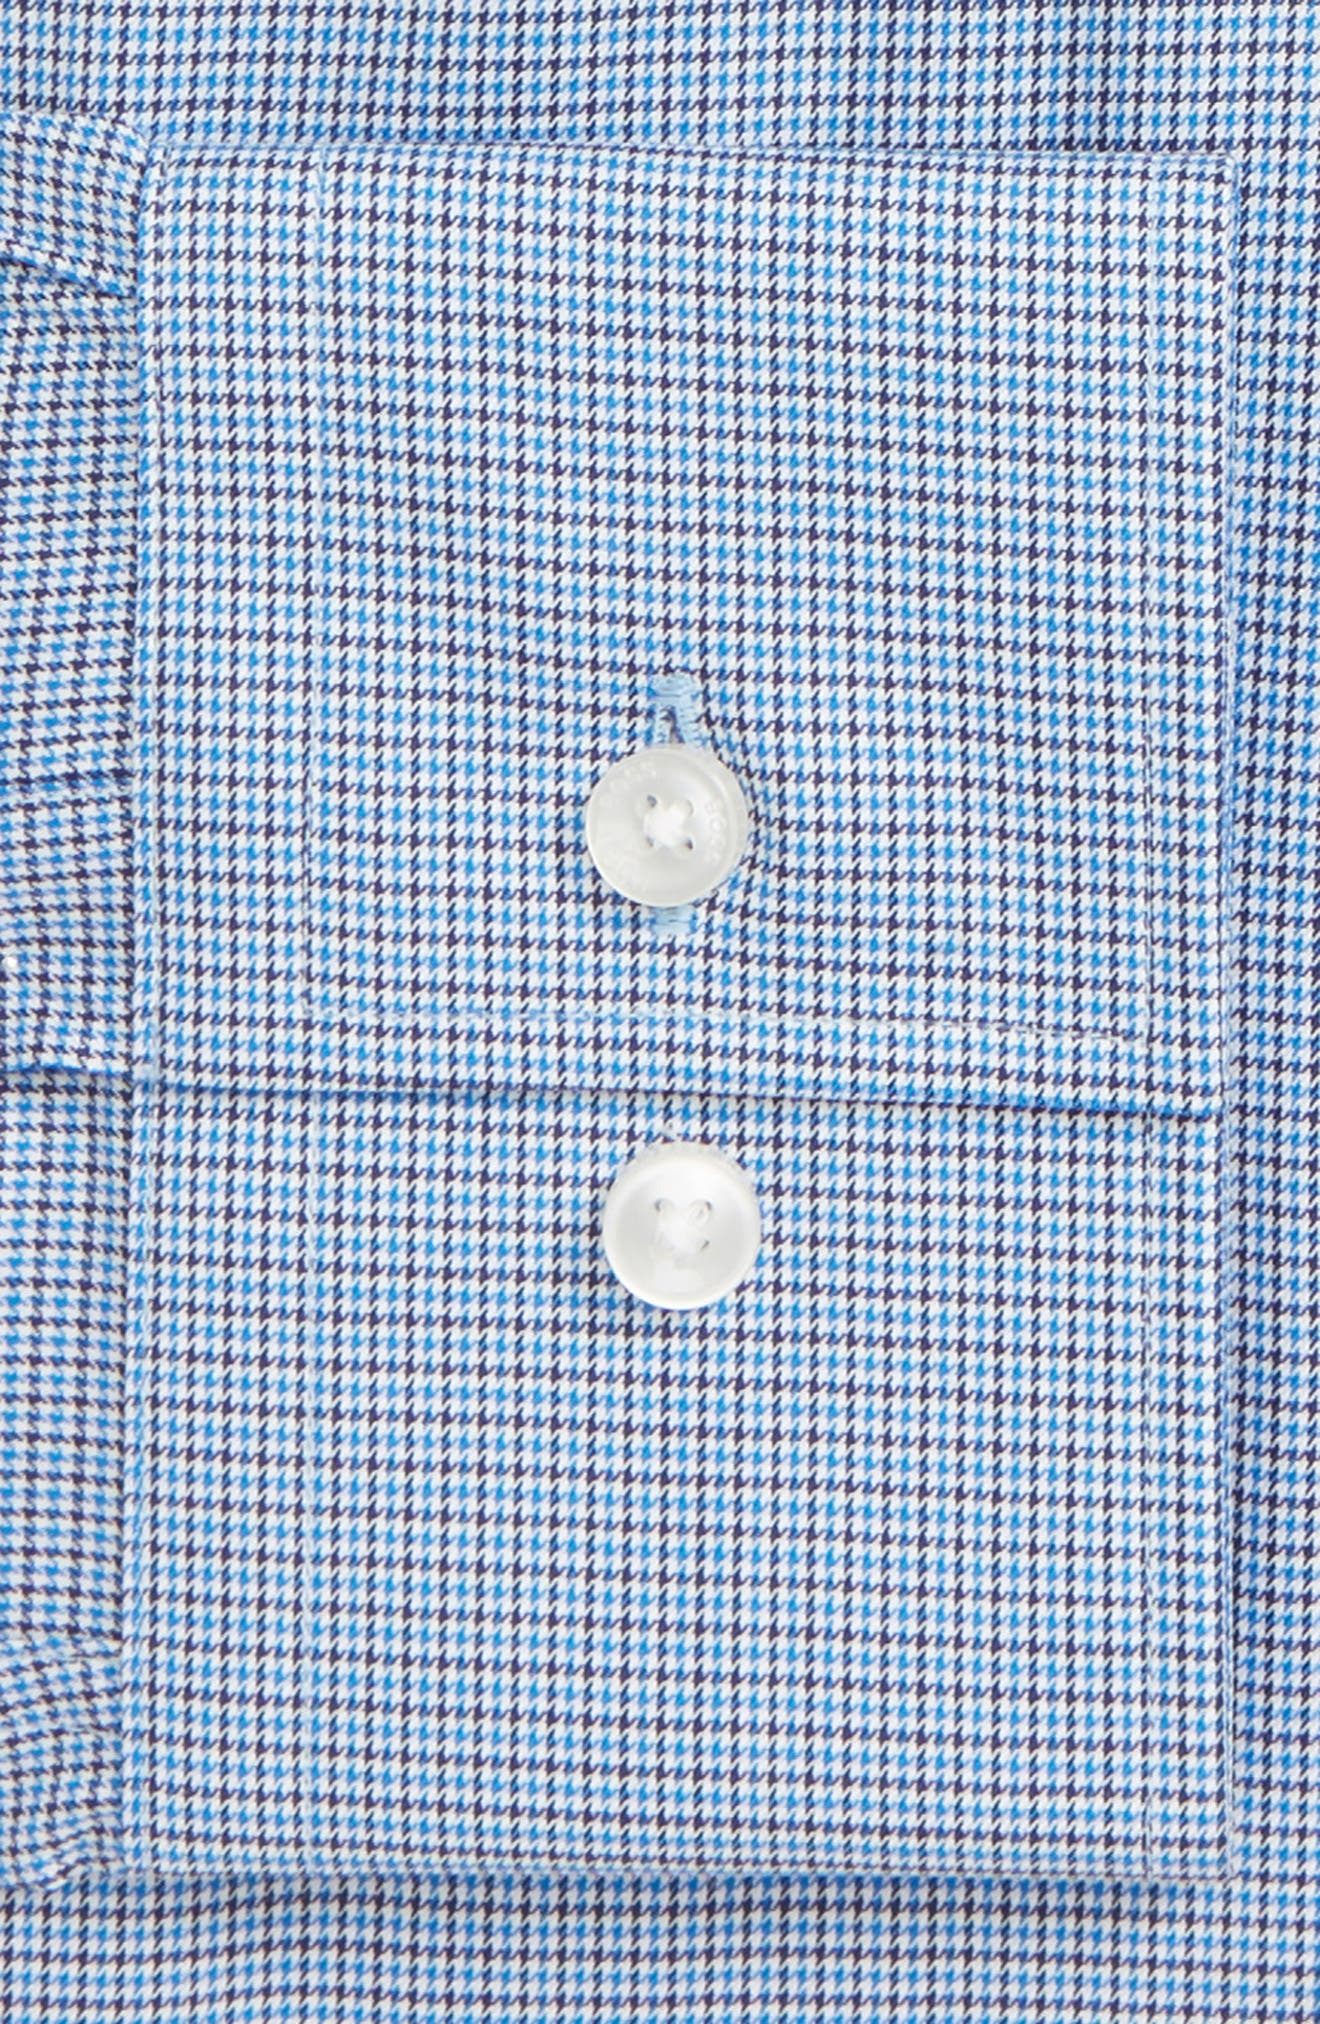 Jason Slim Fit Houndstooth Dress Shirt,                             Alternate thumbnail 2, color,                             BLUE